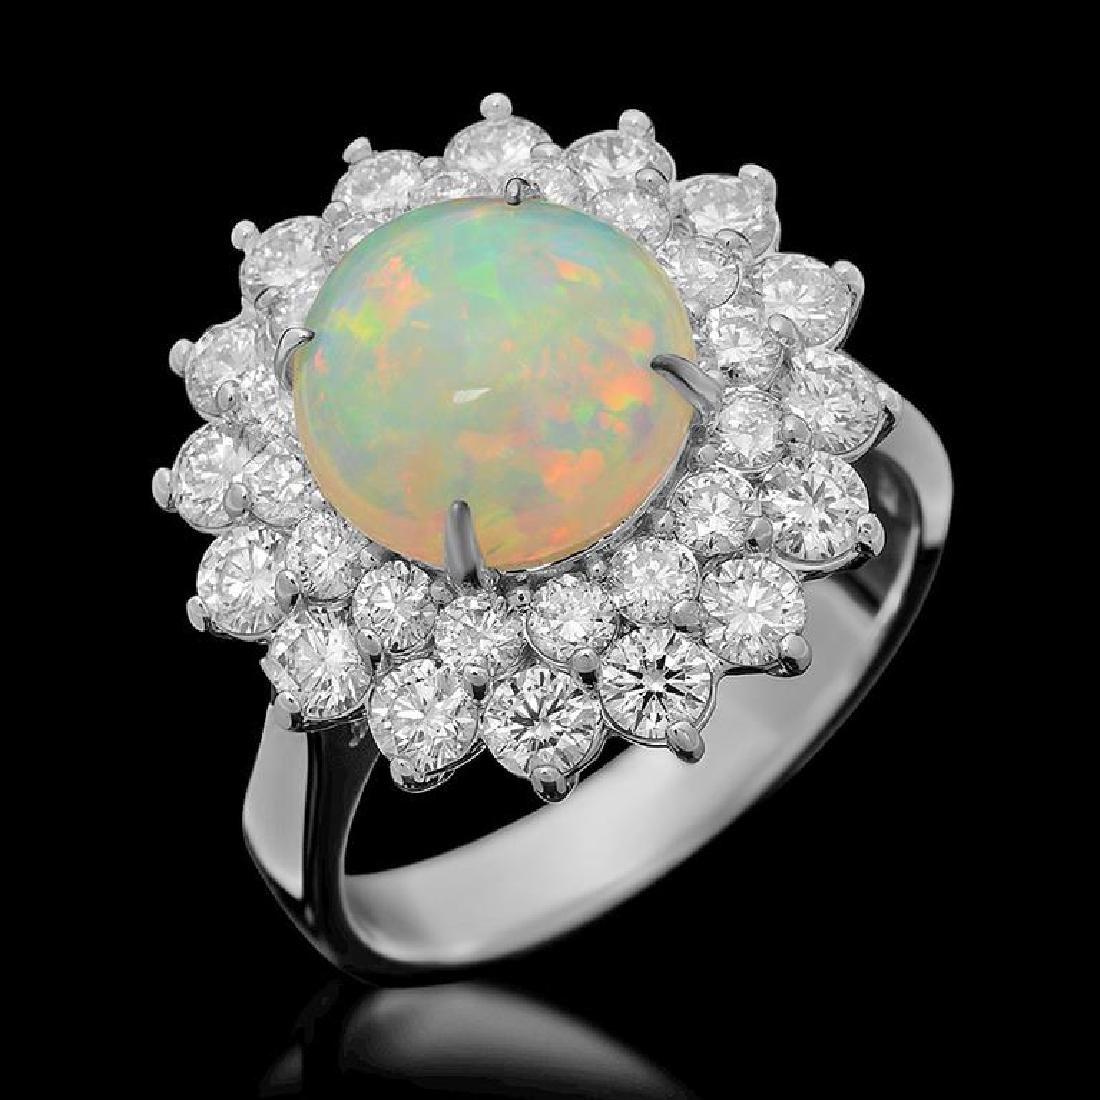 14k Gold 2.73ct Opal 1.95ct Diamond Ring